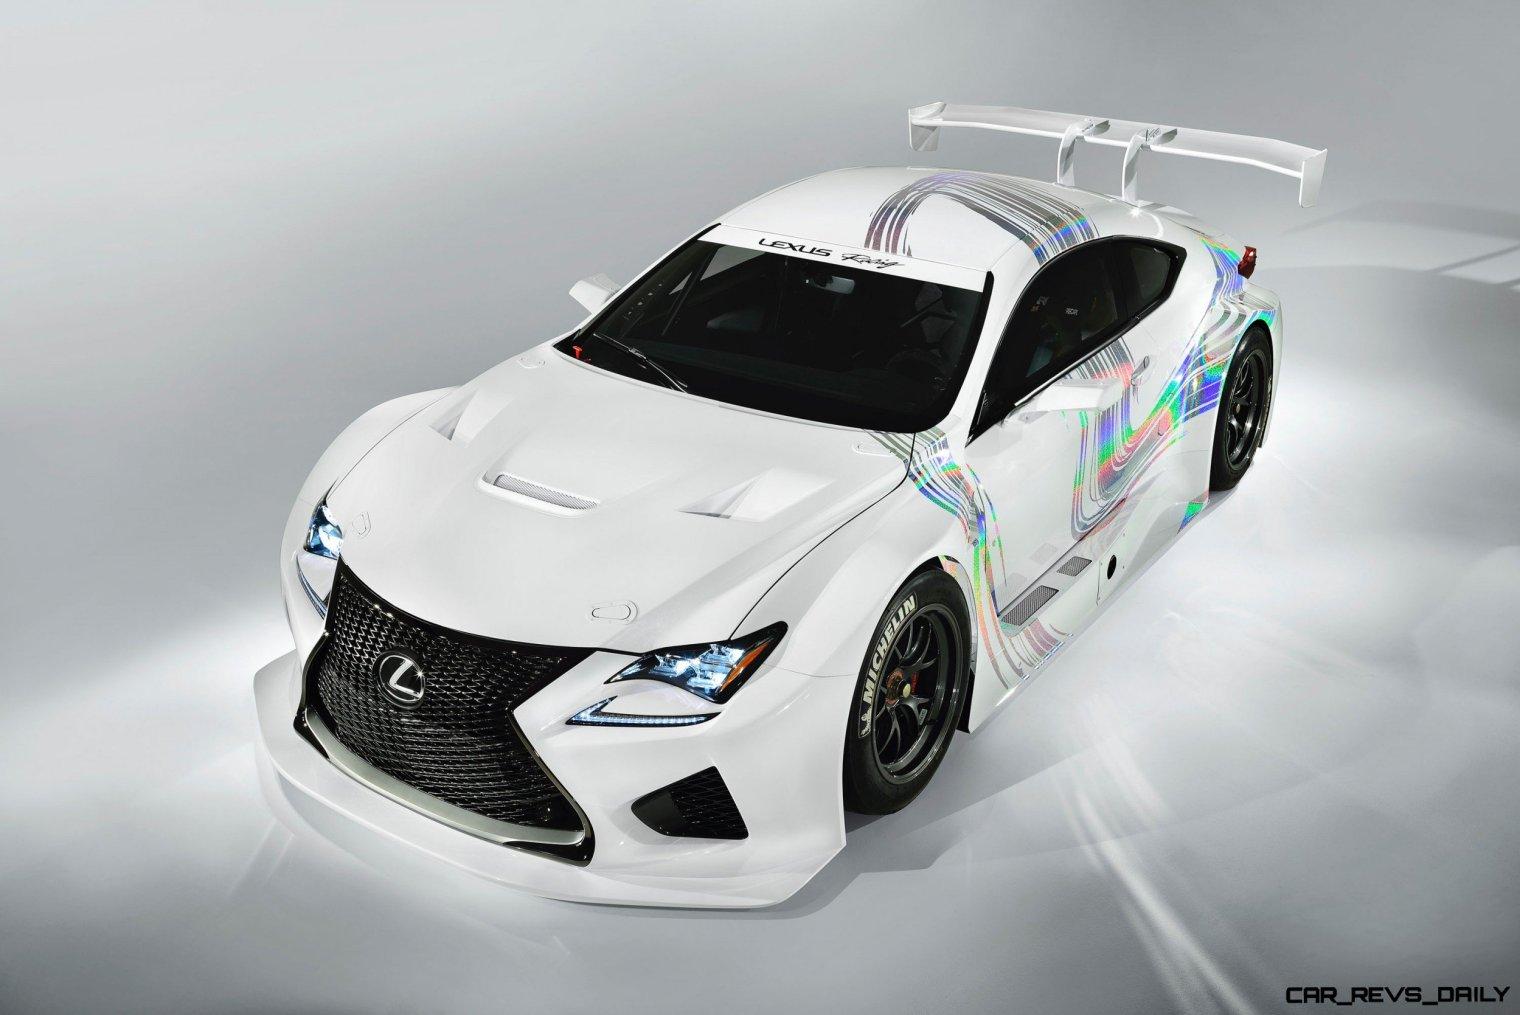 Lexus_RC_F_GT3_Concept_002